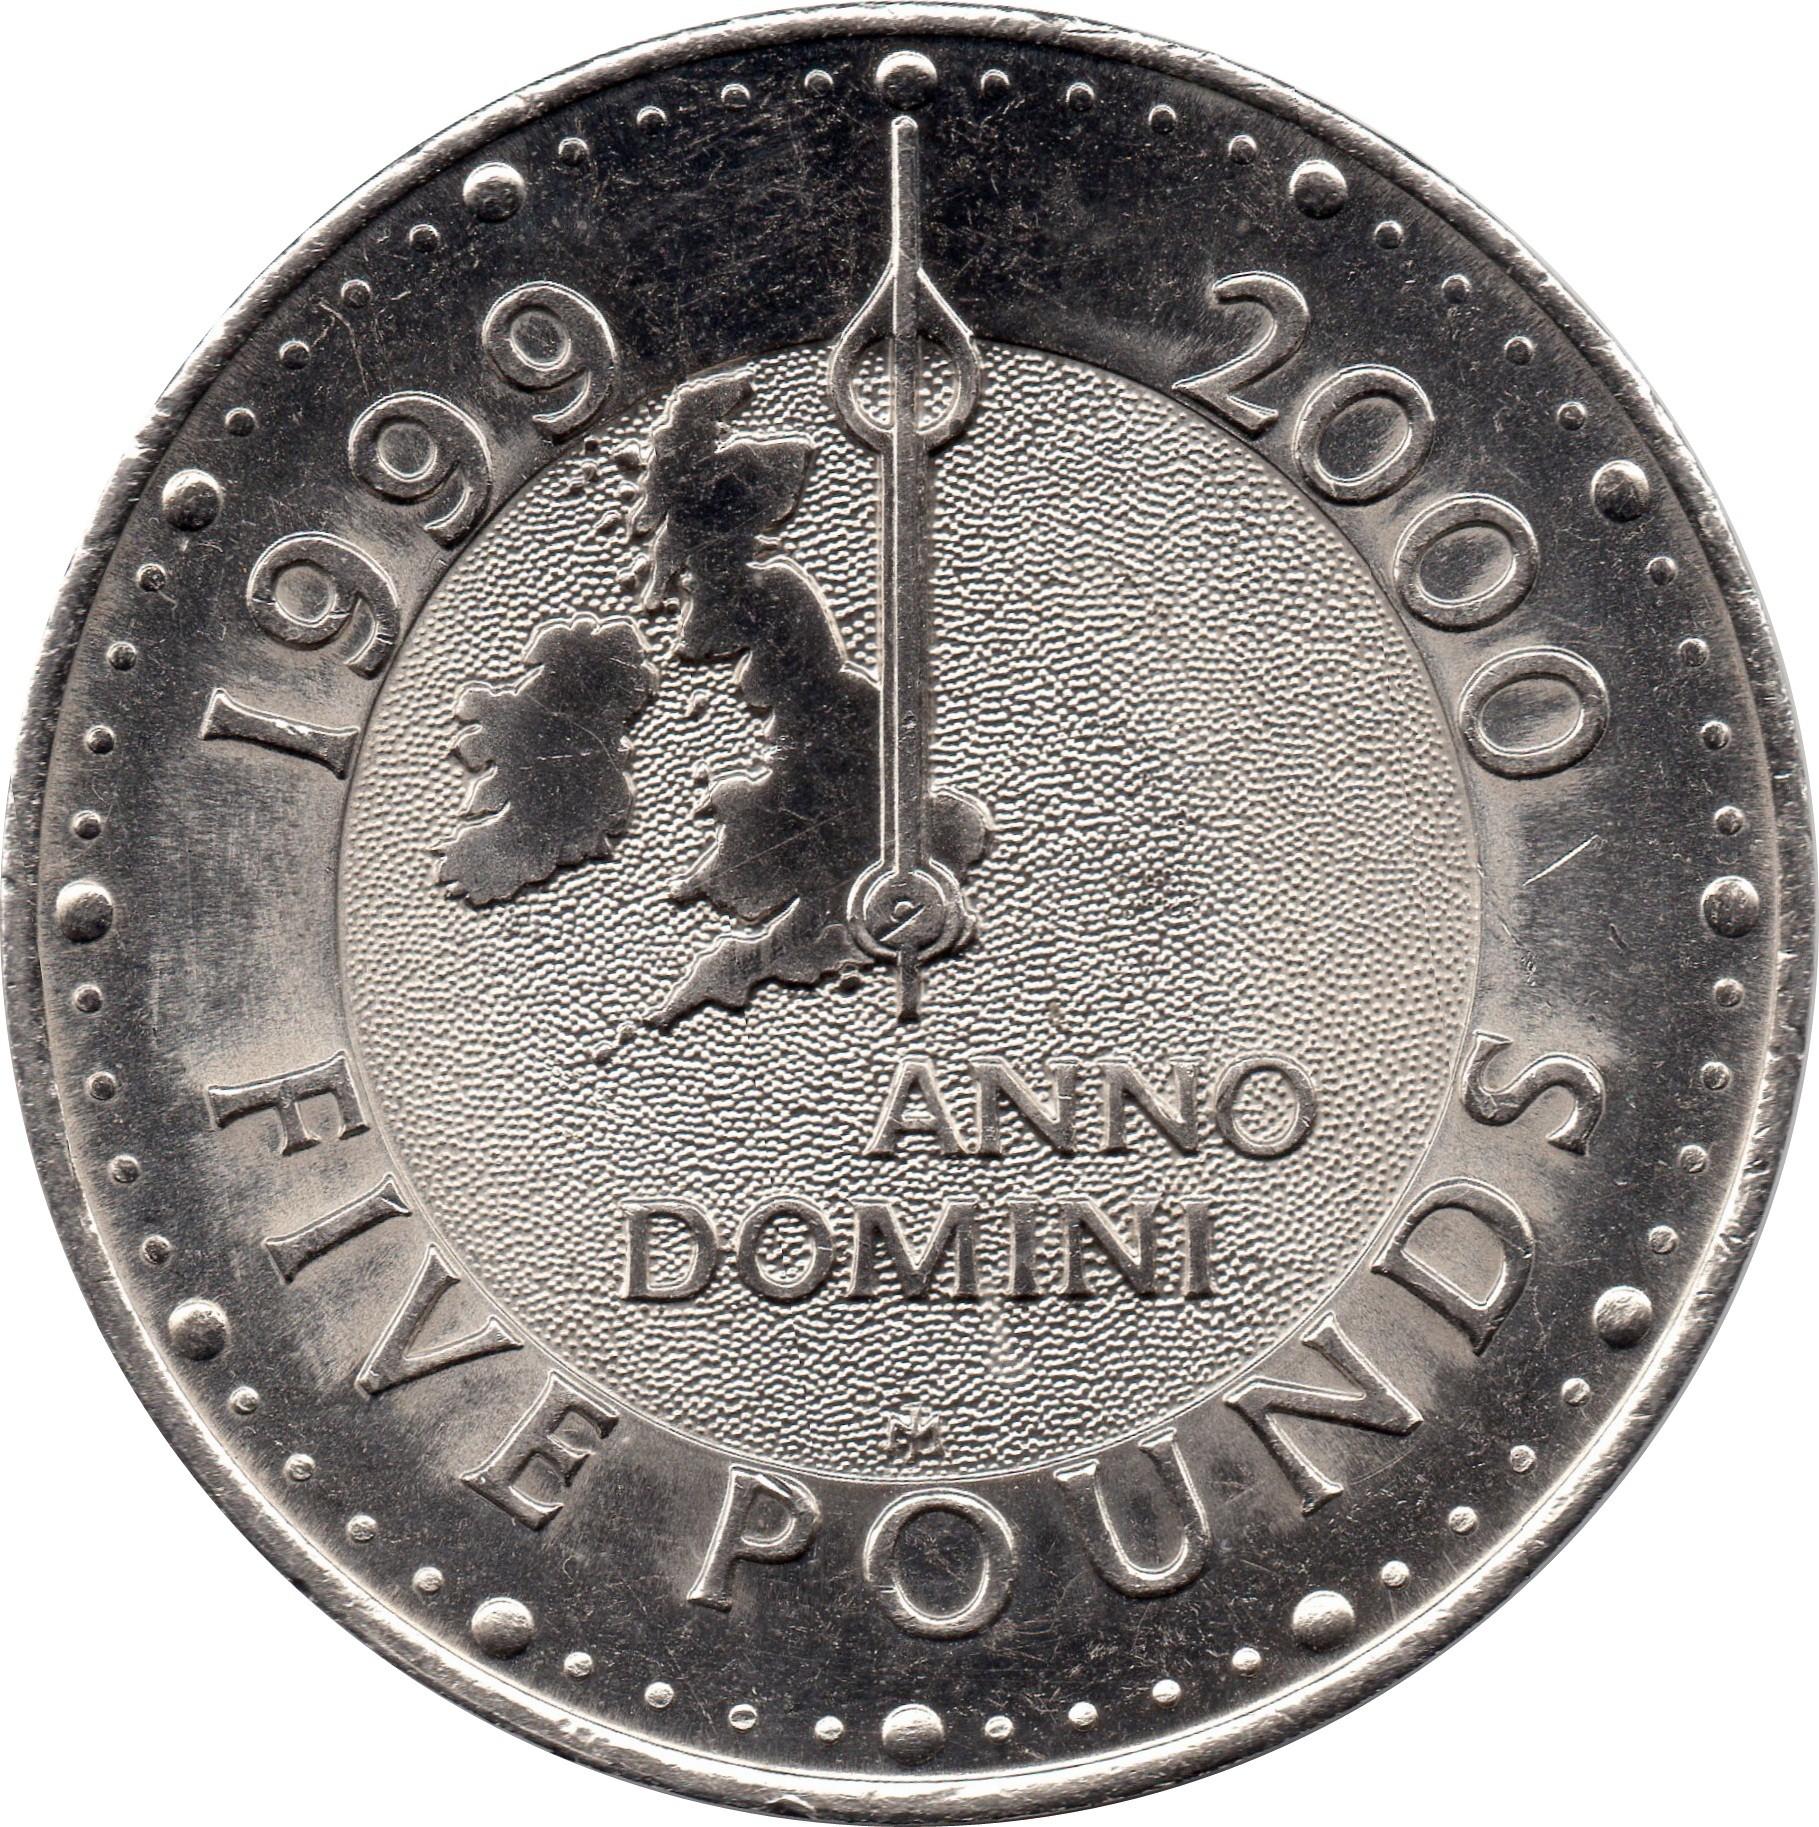 British 5 Pounds (1999-2000 Elizabeth II-Diana, Millennium)